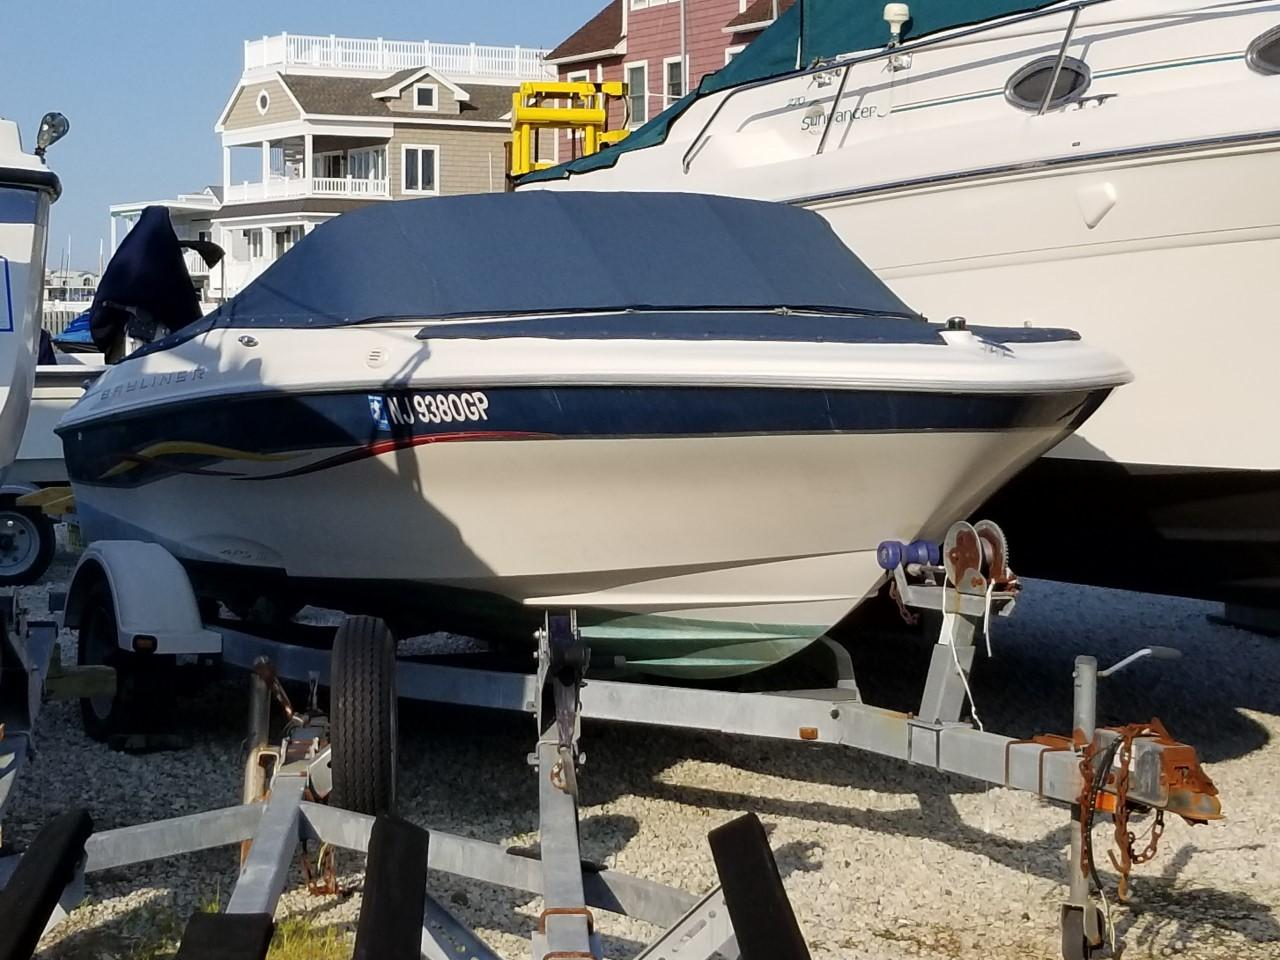 hight resolution of 2001 bayliner 185 capri power boat for sale www yachtworld com rh yachtworld com 1996 bayliner